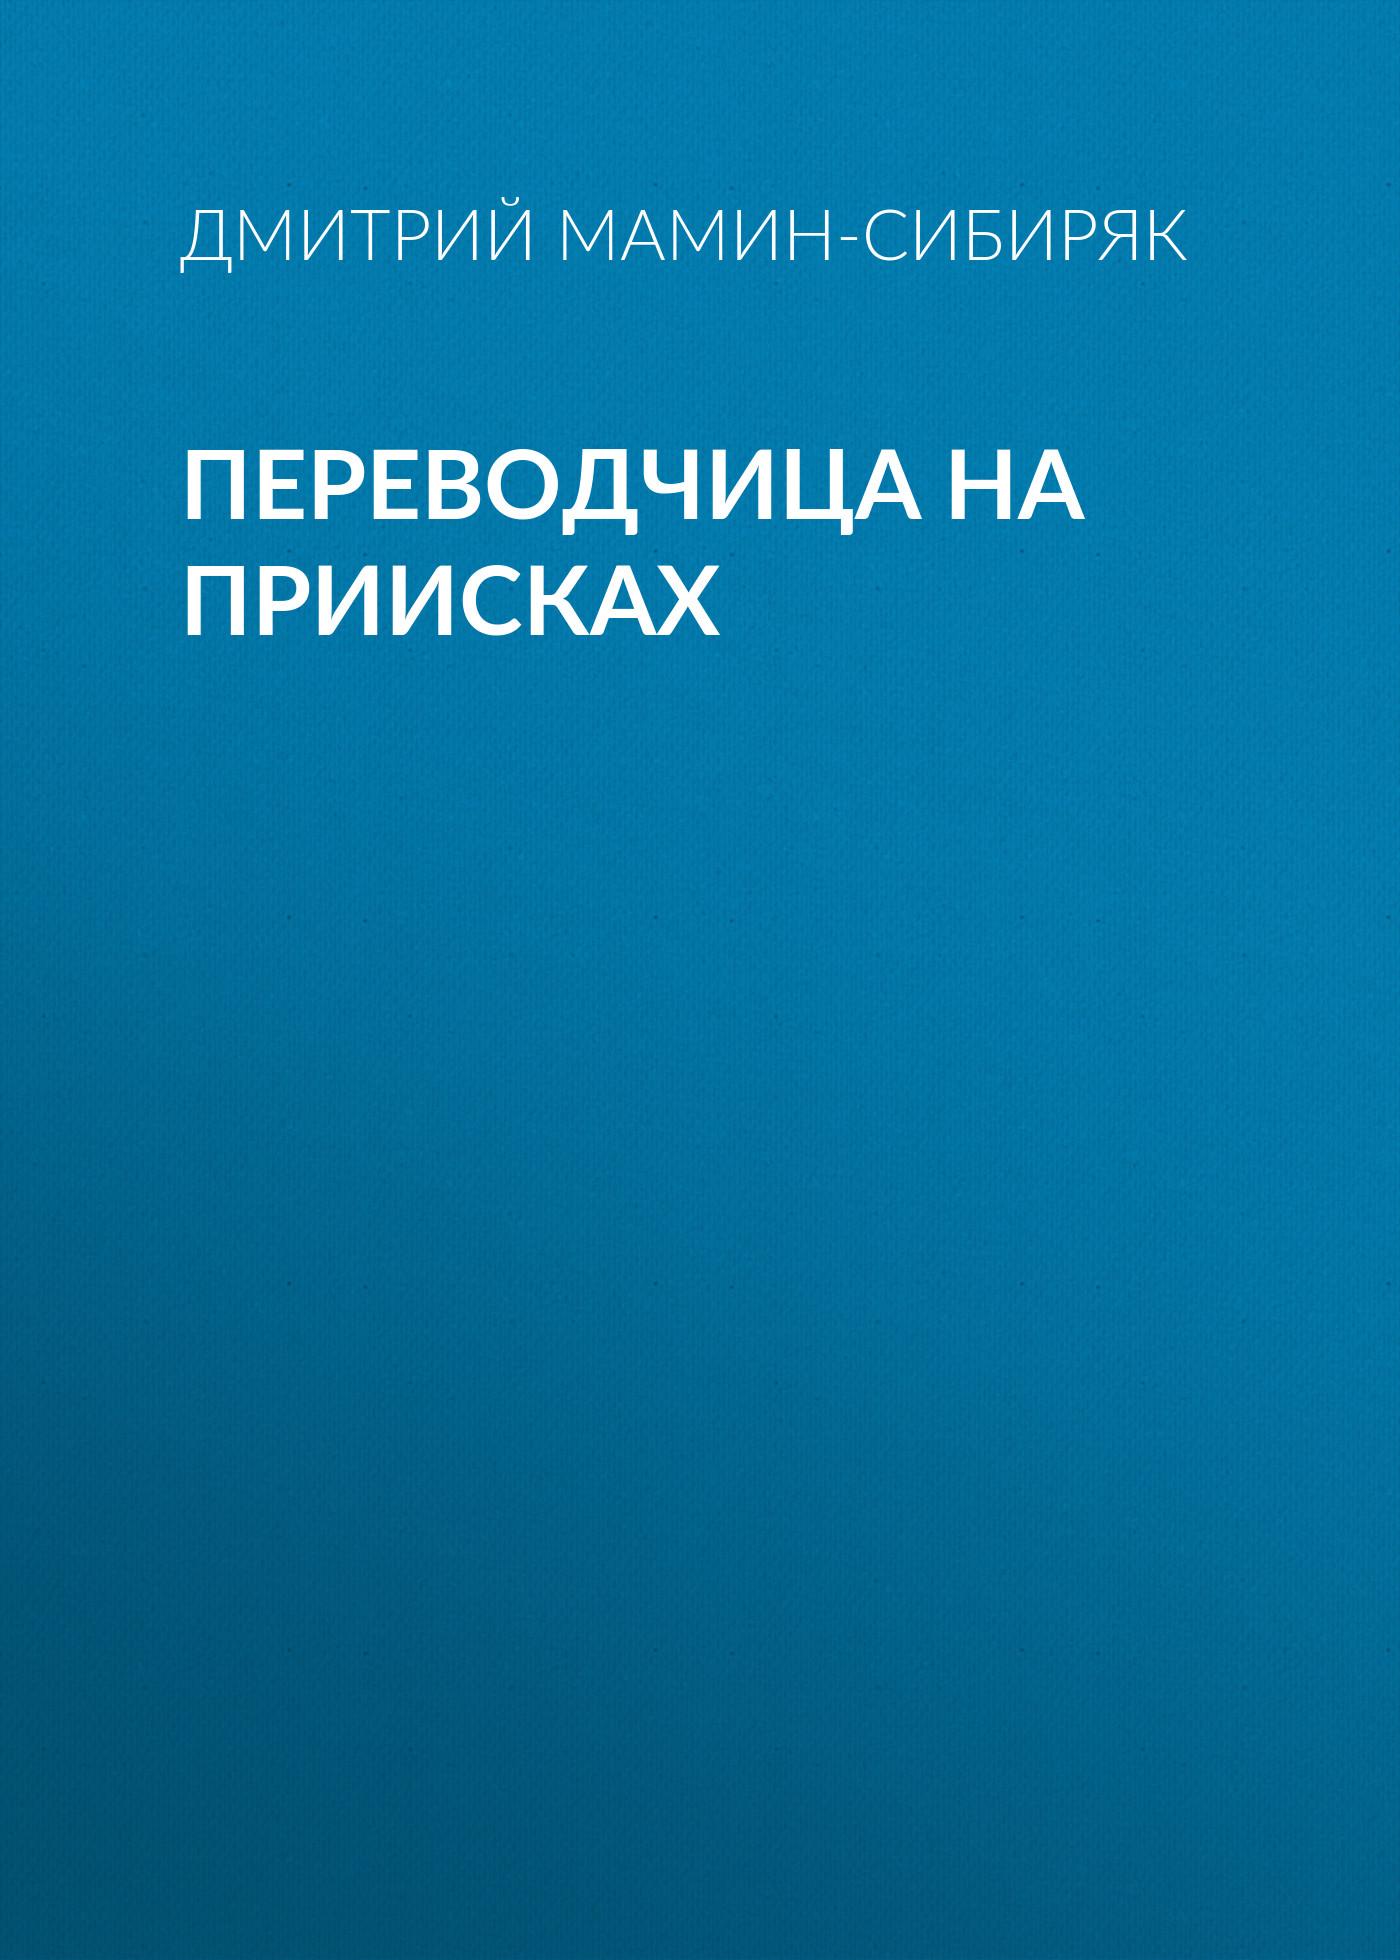 Дмитрий Мамин-Сибиряк Переводчица на приисках дмитрий мамин сибиряк три конца